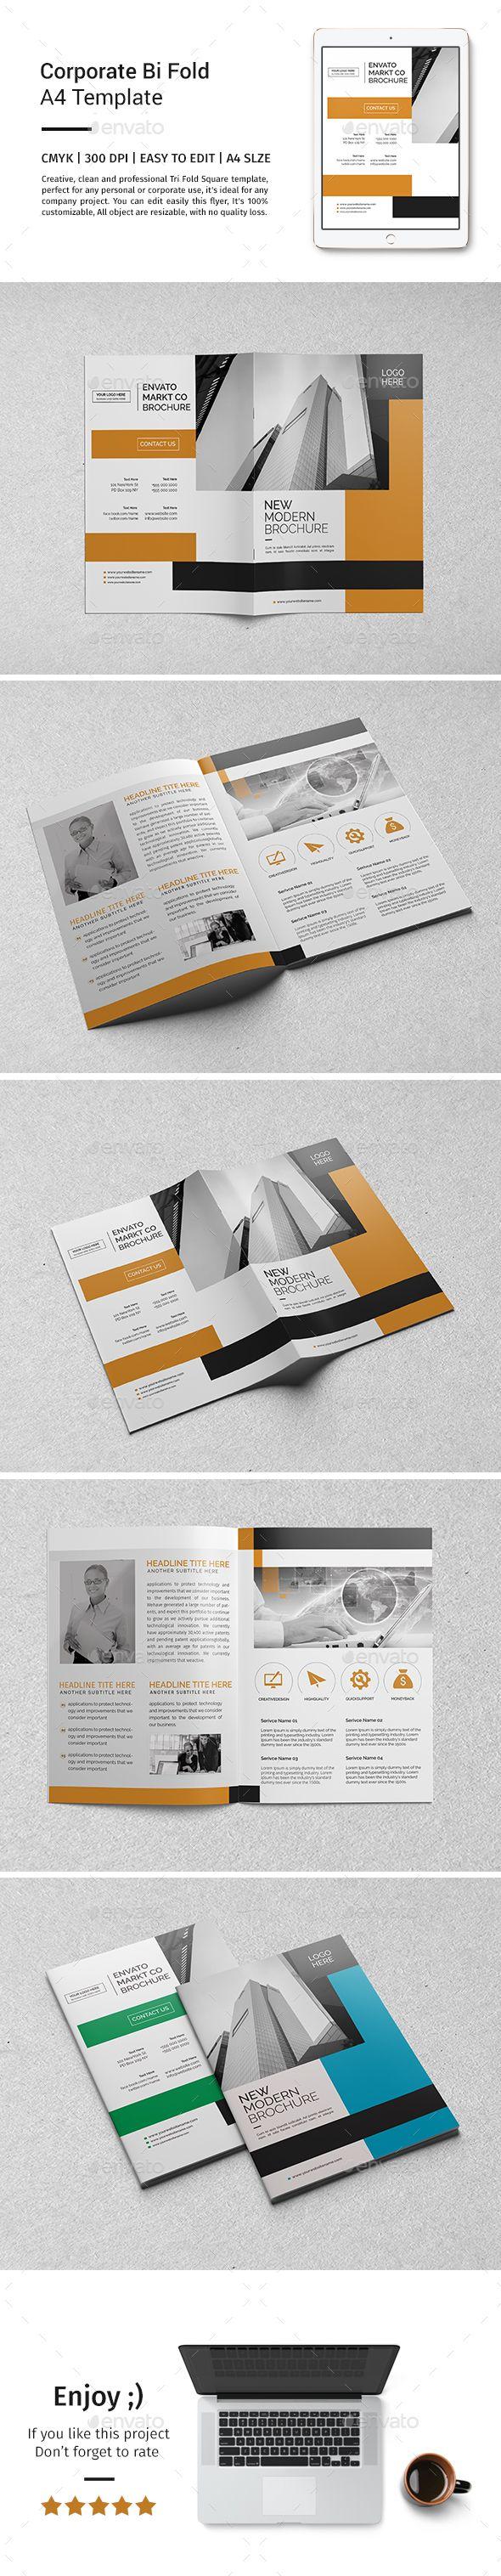 Corporate Bi-fold Brochure Template PSD. Download here: http://graphicriver.net/item/corporate-bifold-brochure-template-08/15622238?ref=ksioks